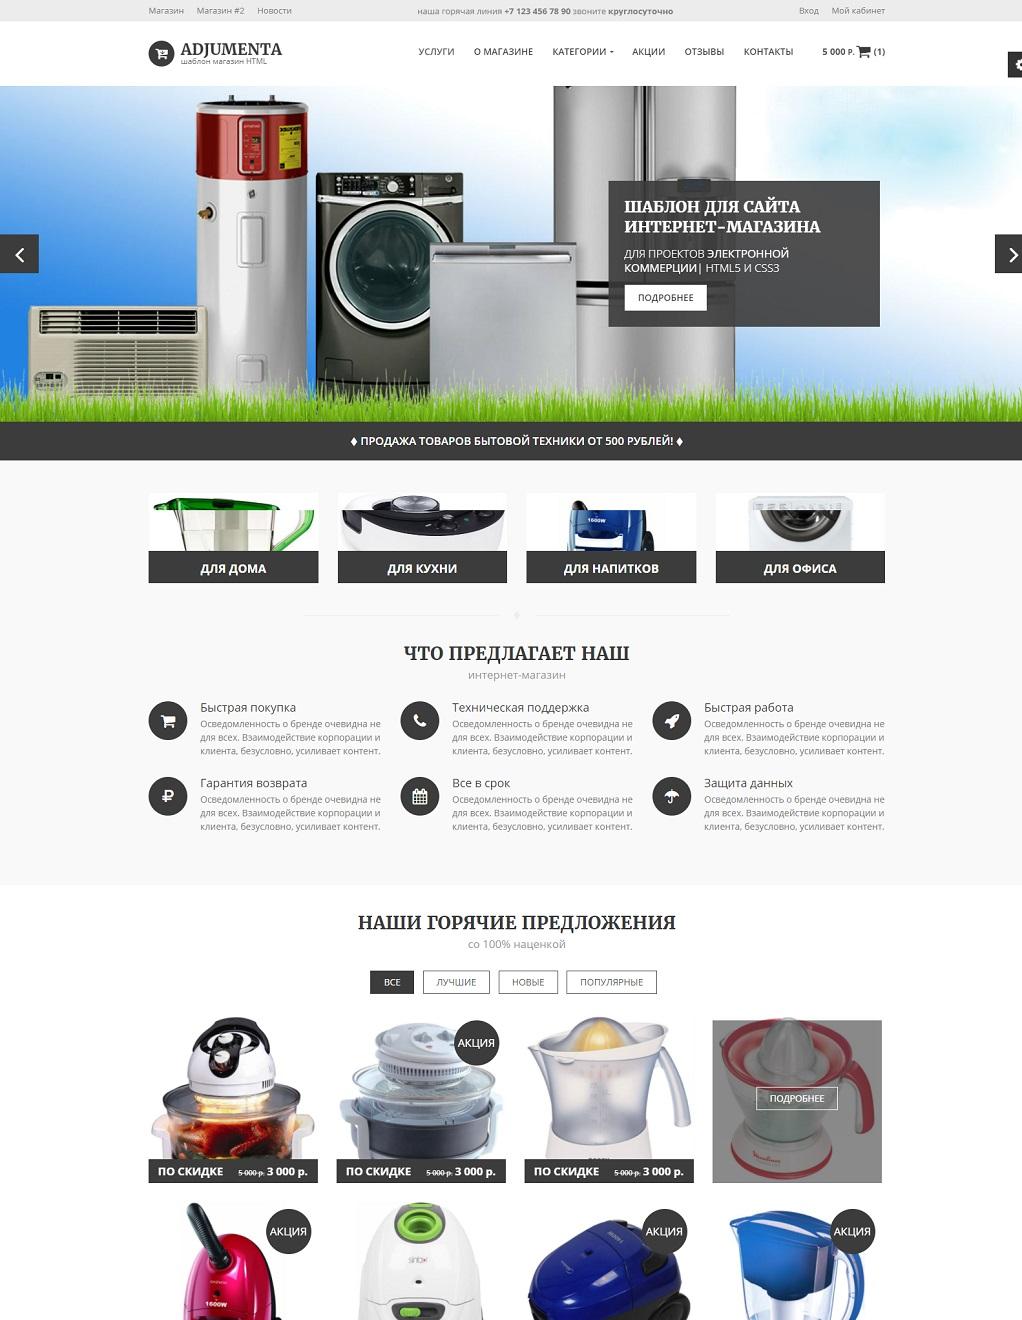 Adjumenta | HTML5 шаблон для интернет-магазина бытовой техники